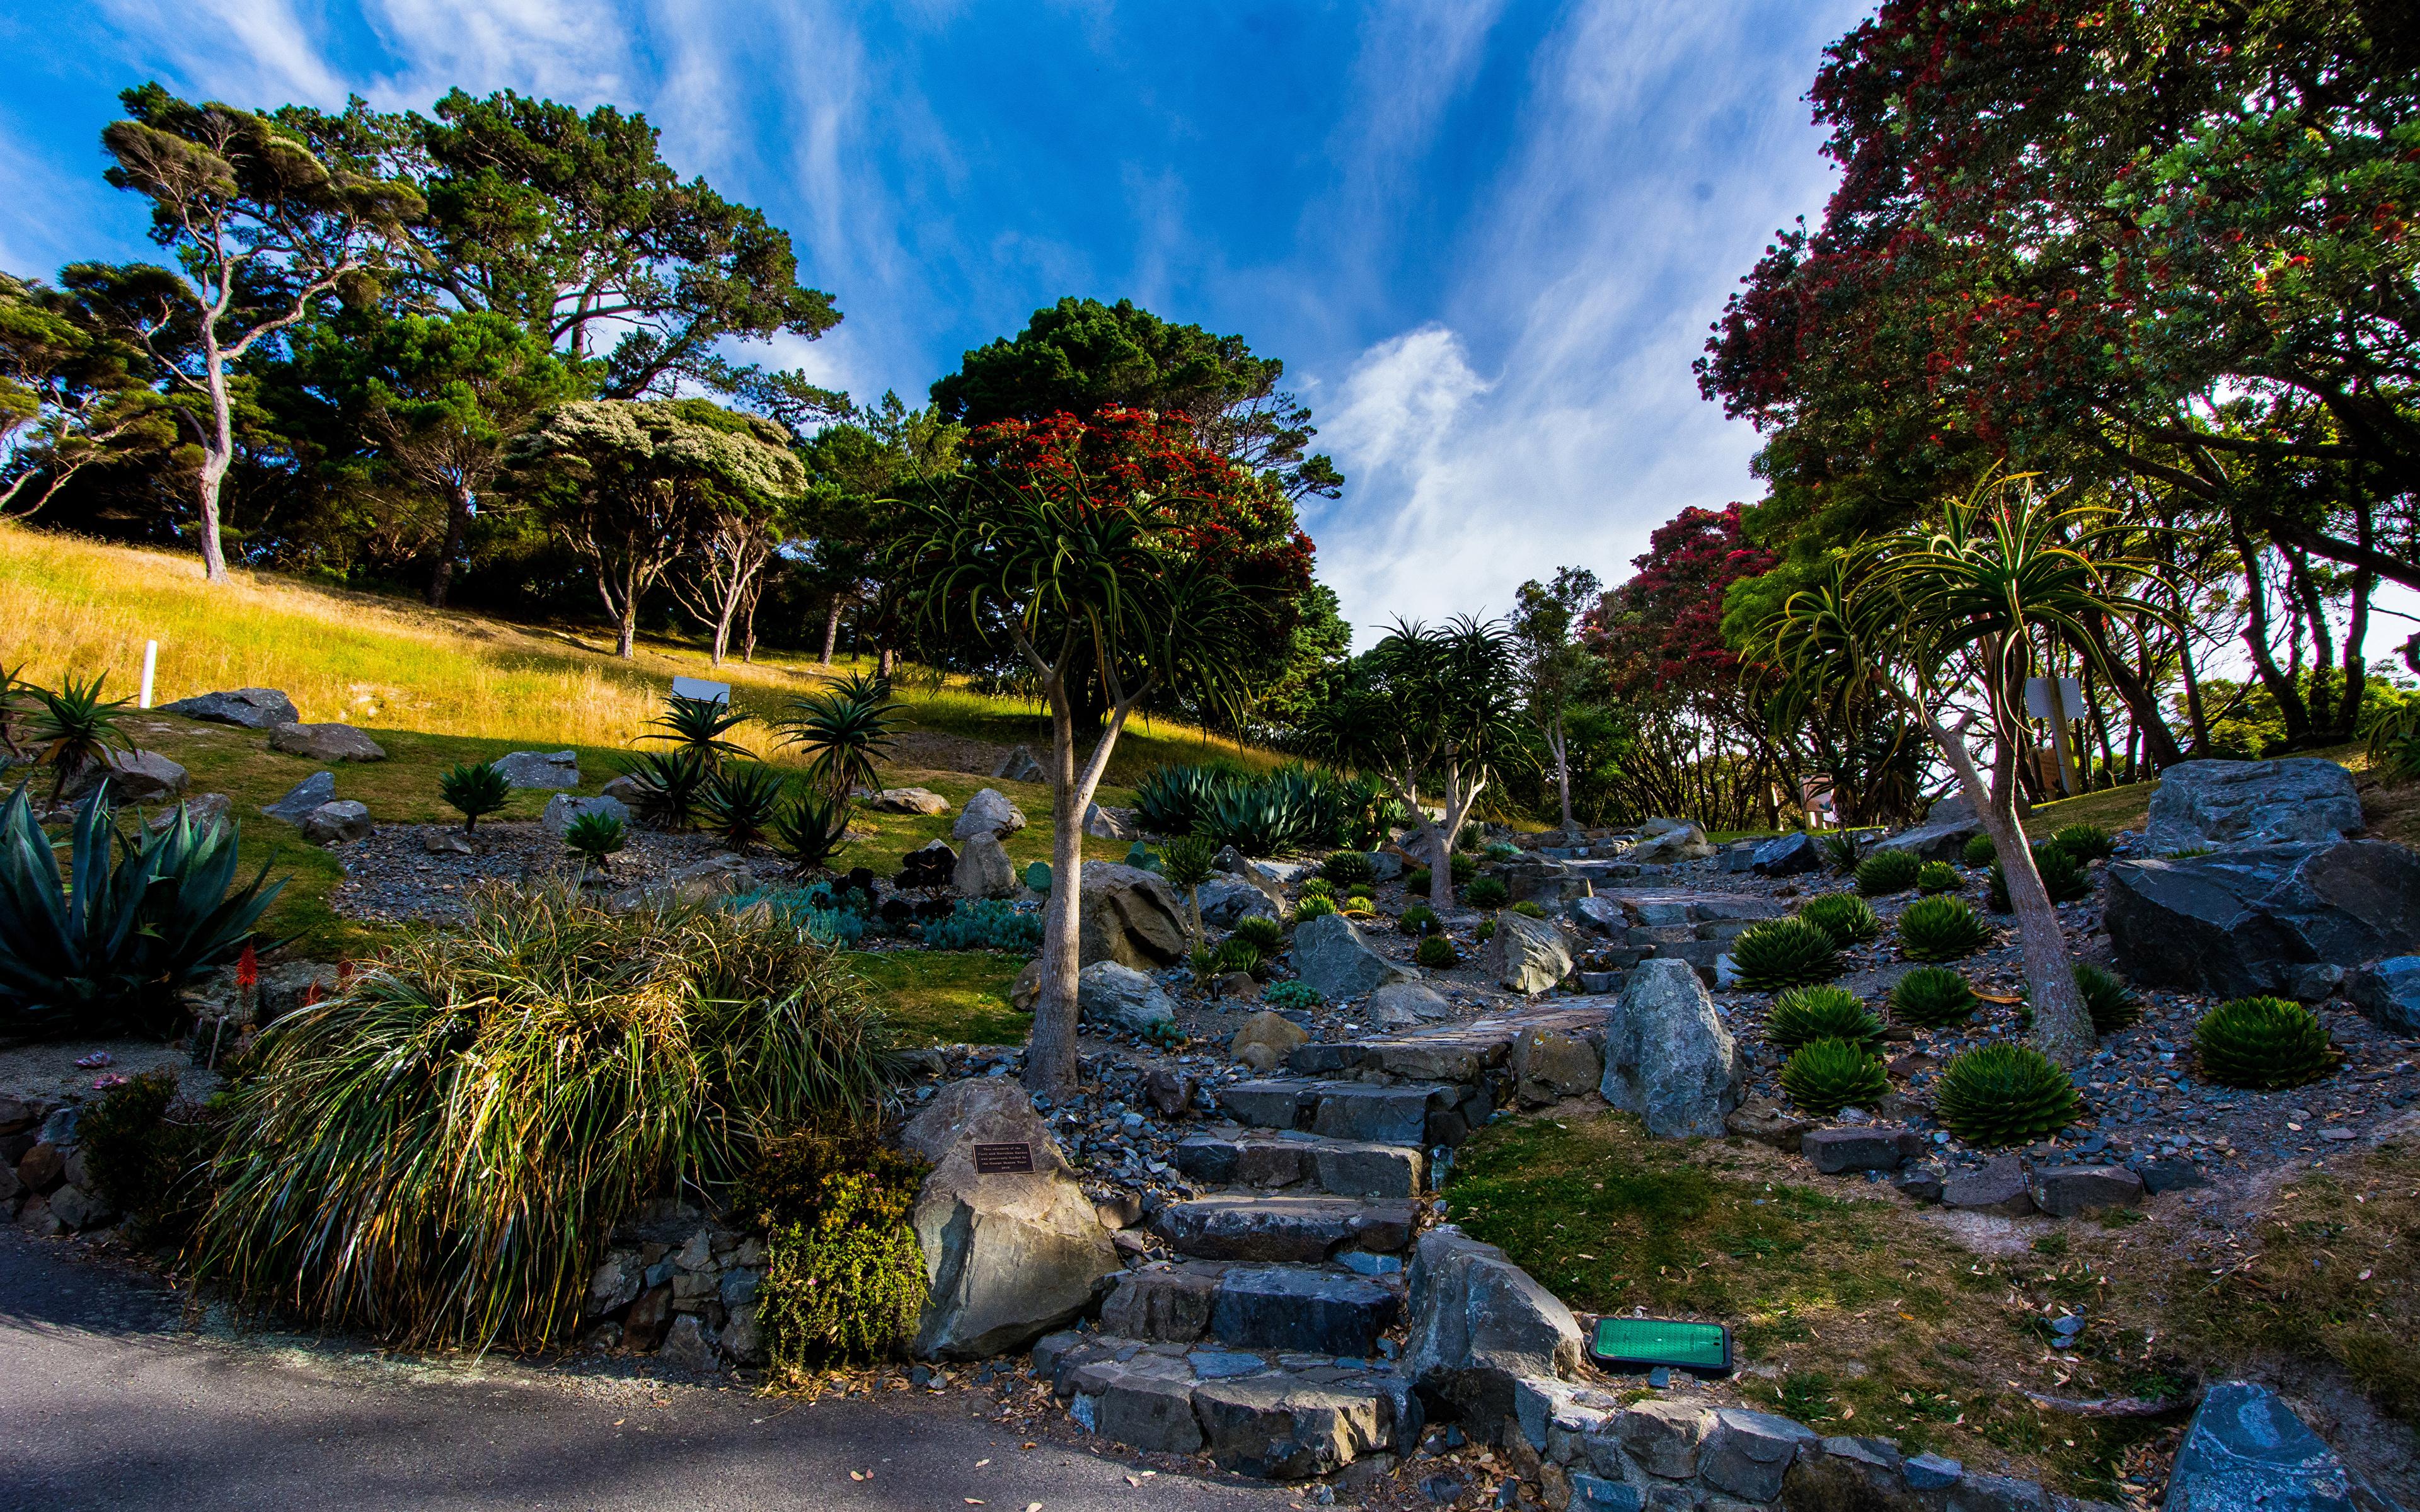 Images New Zealand Wellington Botanical garden Nature 3840x2400 3840x2400